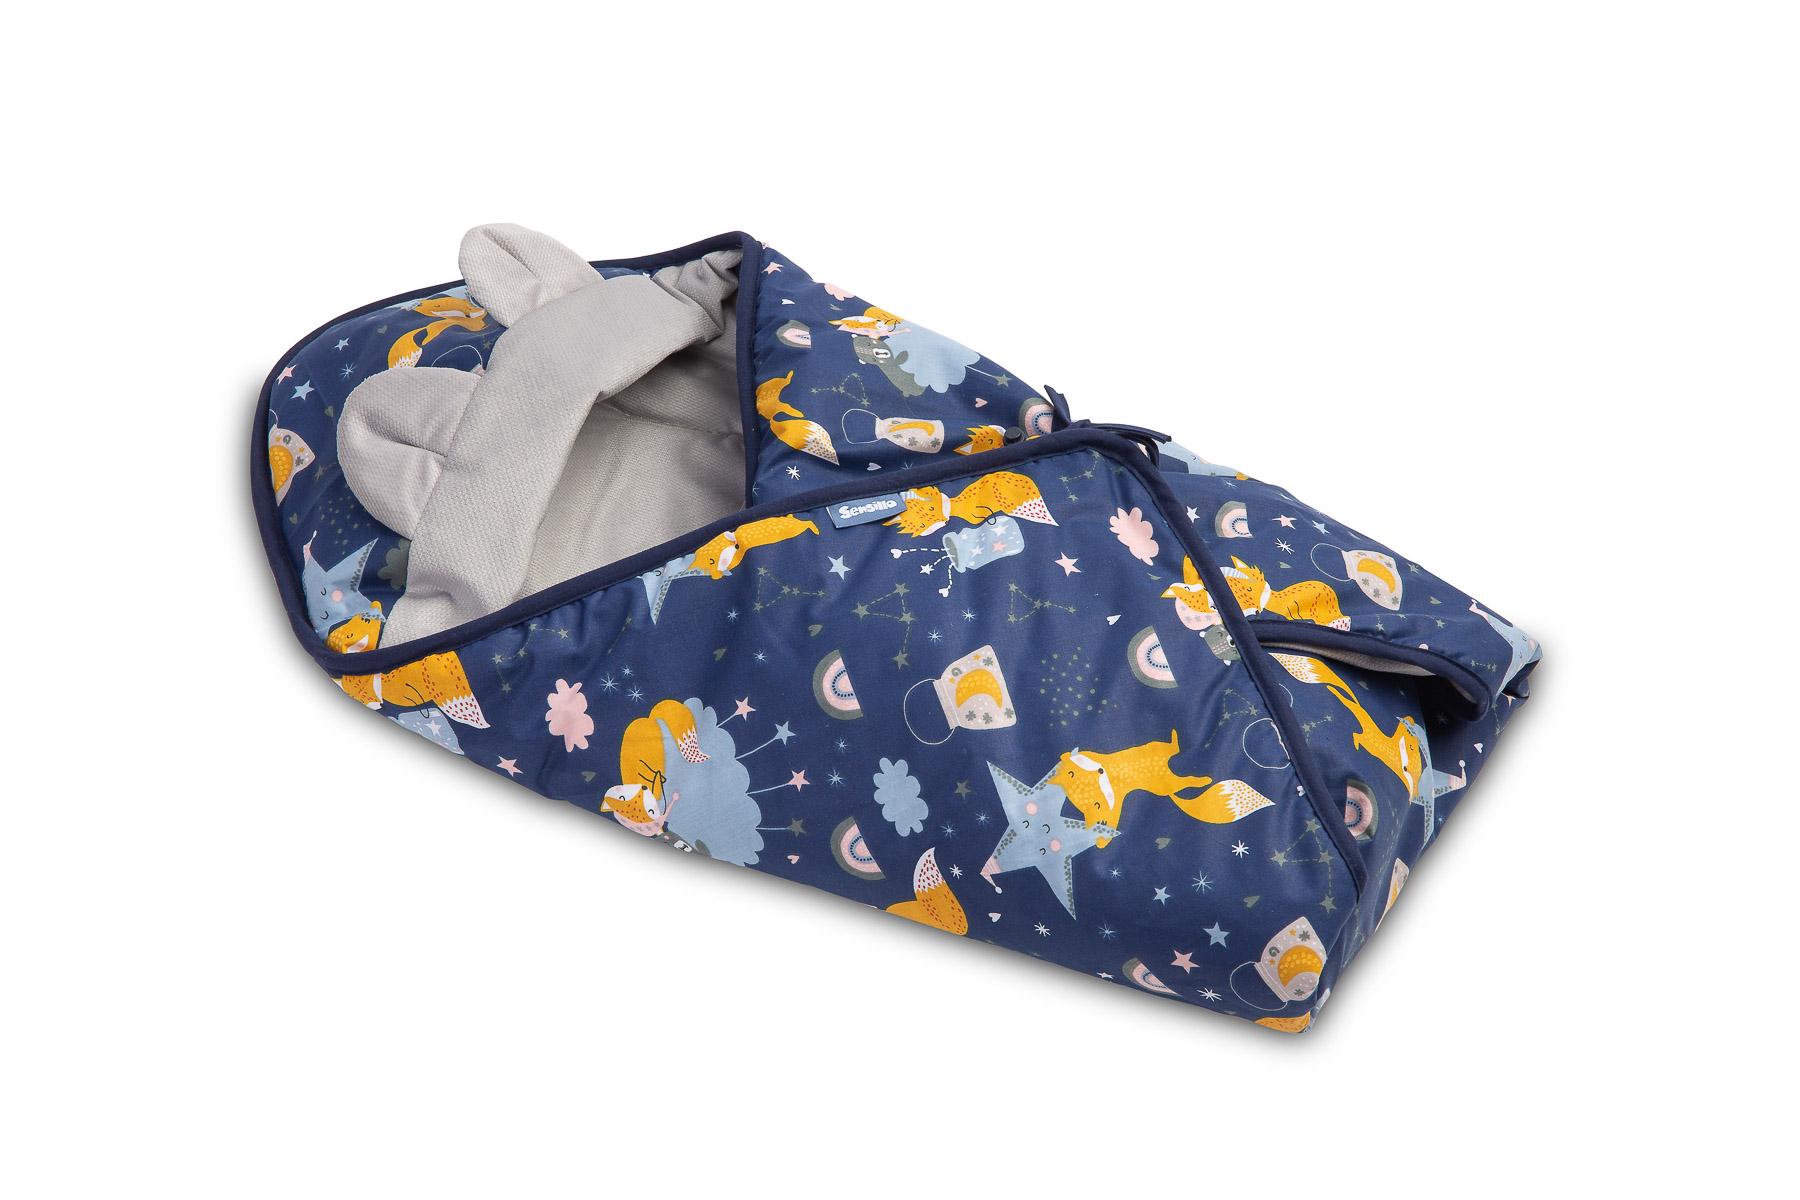 Velvet carry-cot swaddle blanket – navy foxes